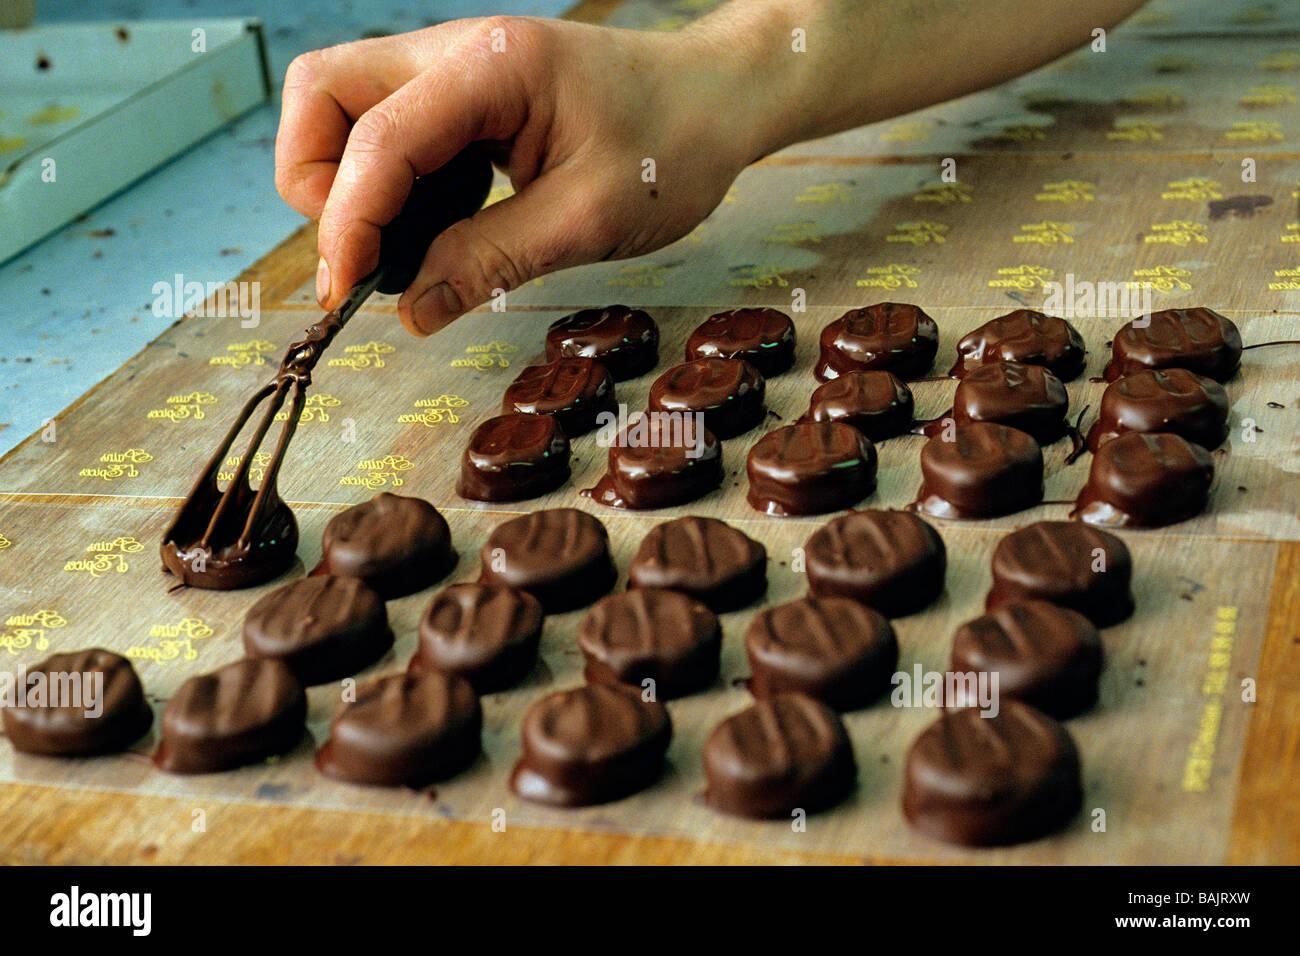 France, Saone et Loire, La Clayette, the chocolate maker Bernard ...